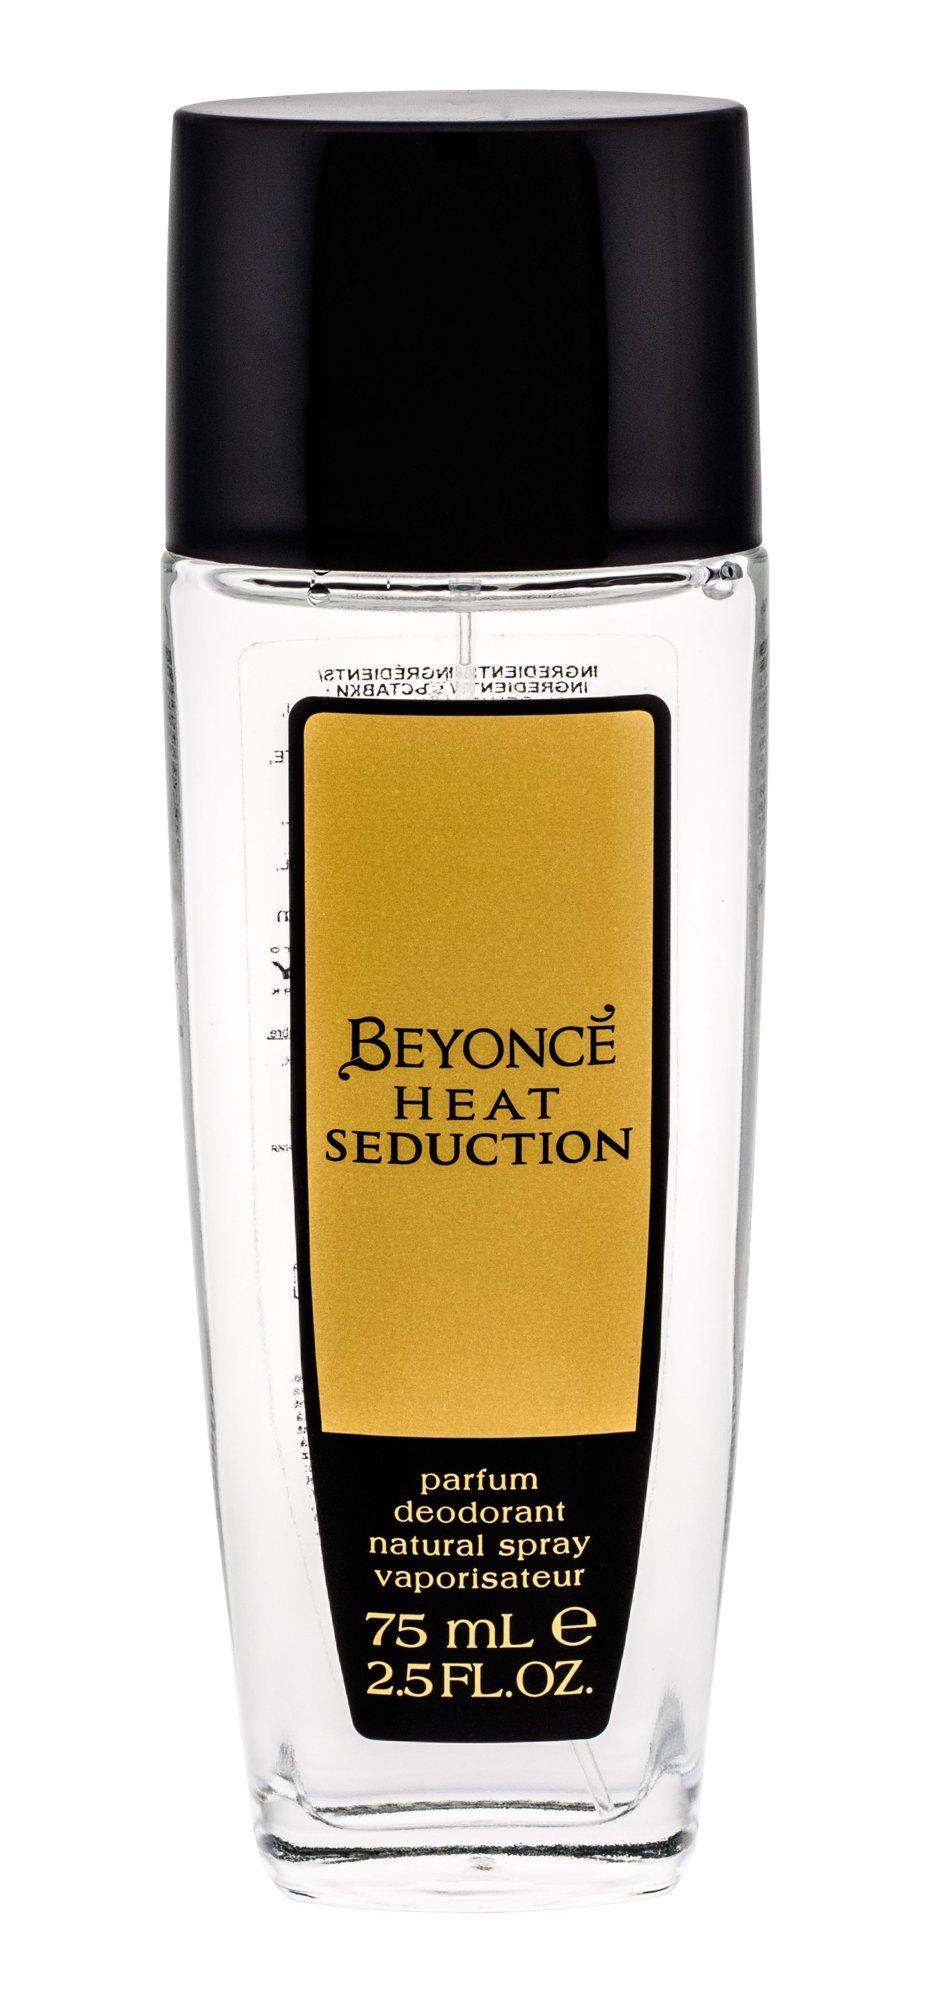 Beyonce Heat Seduction Deodorant 75ml